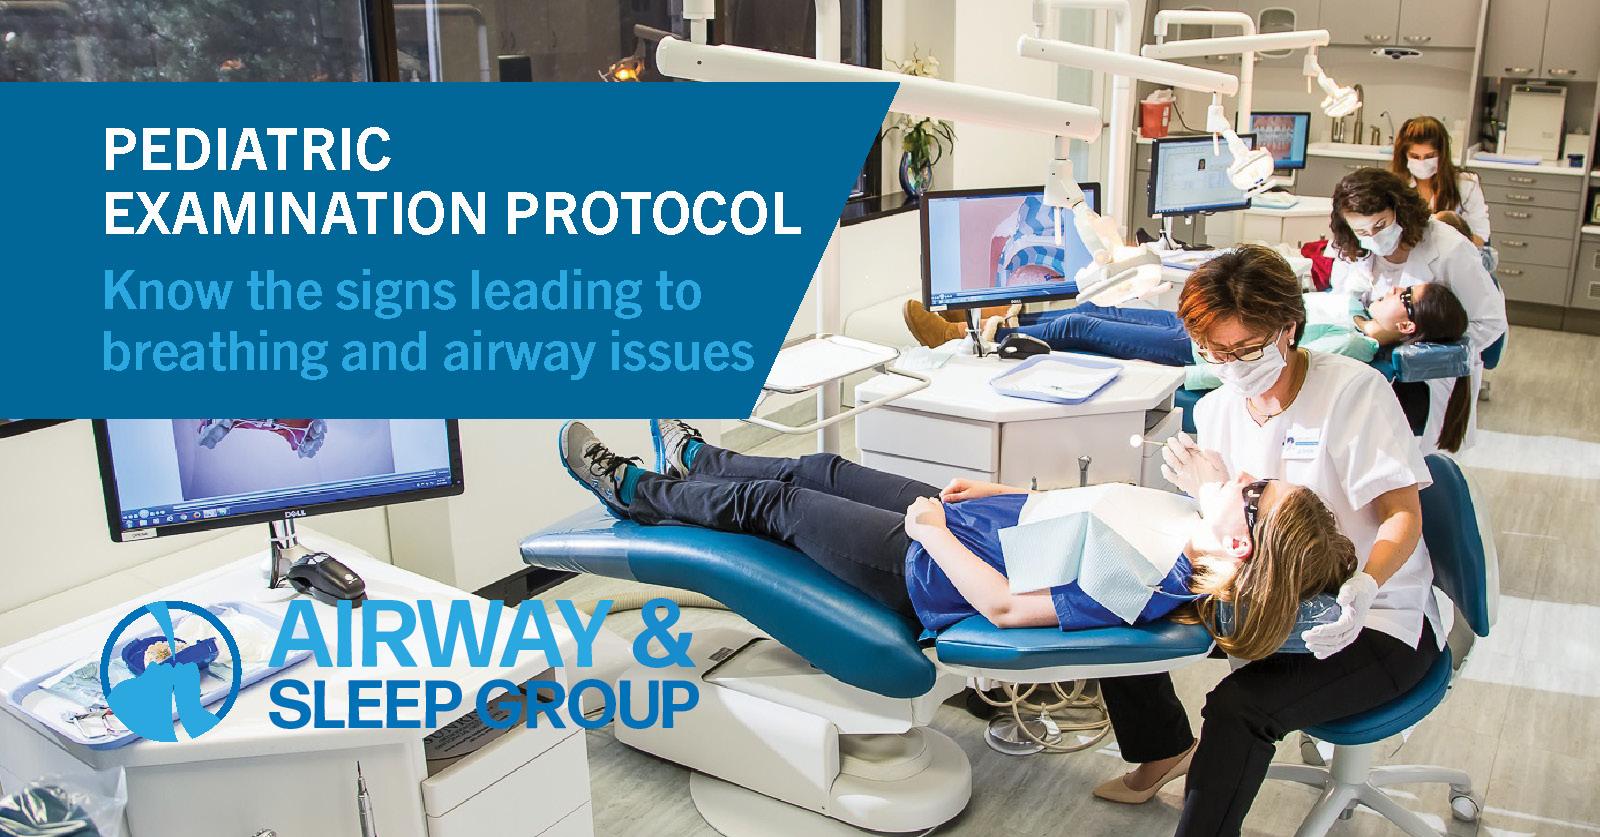 Pediatric Examination Protocol